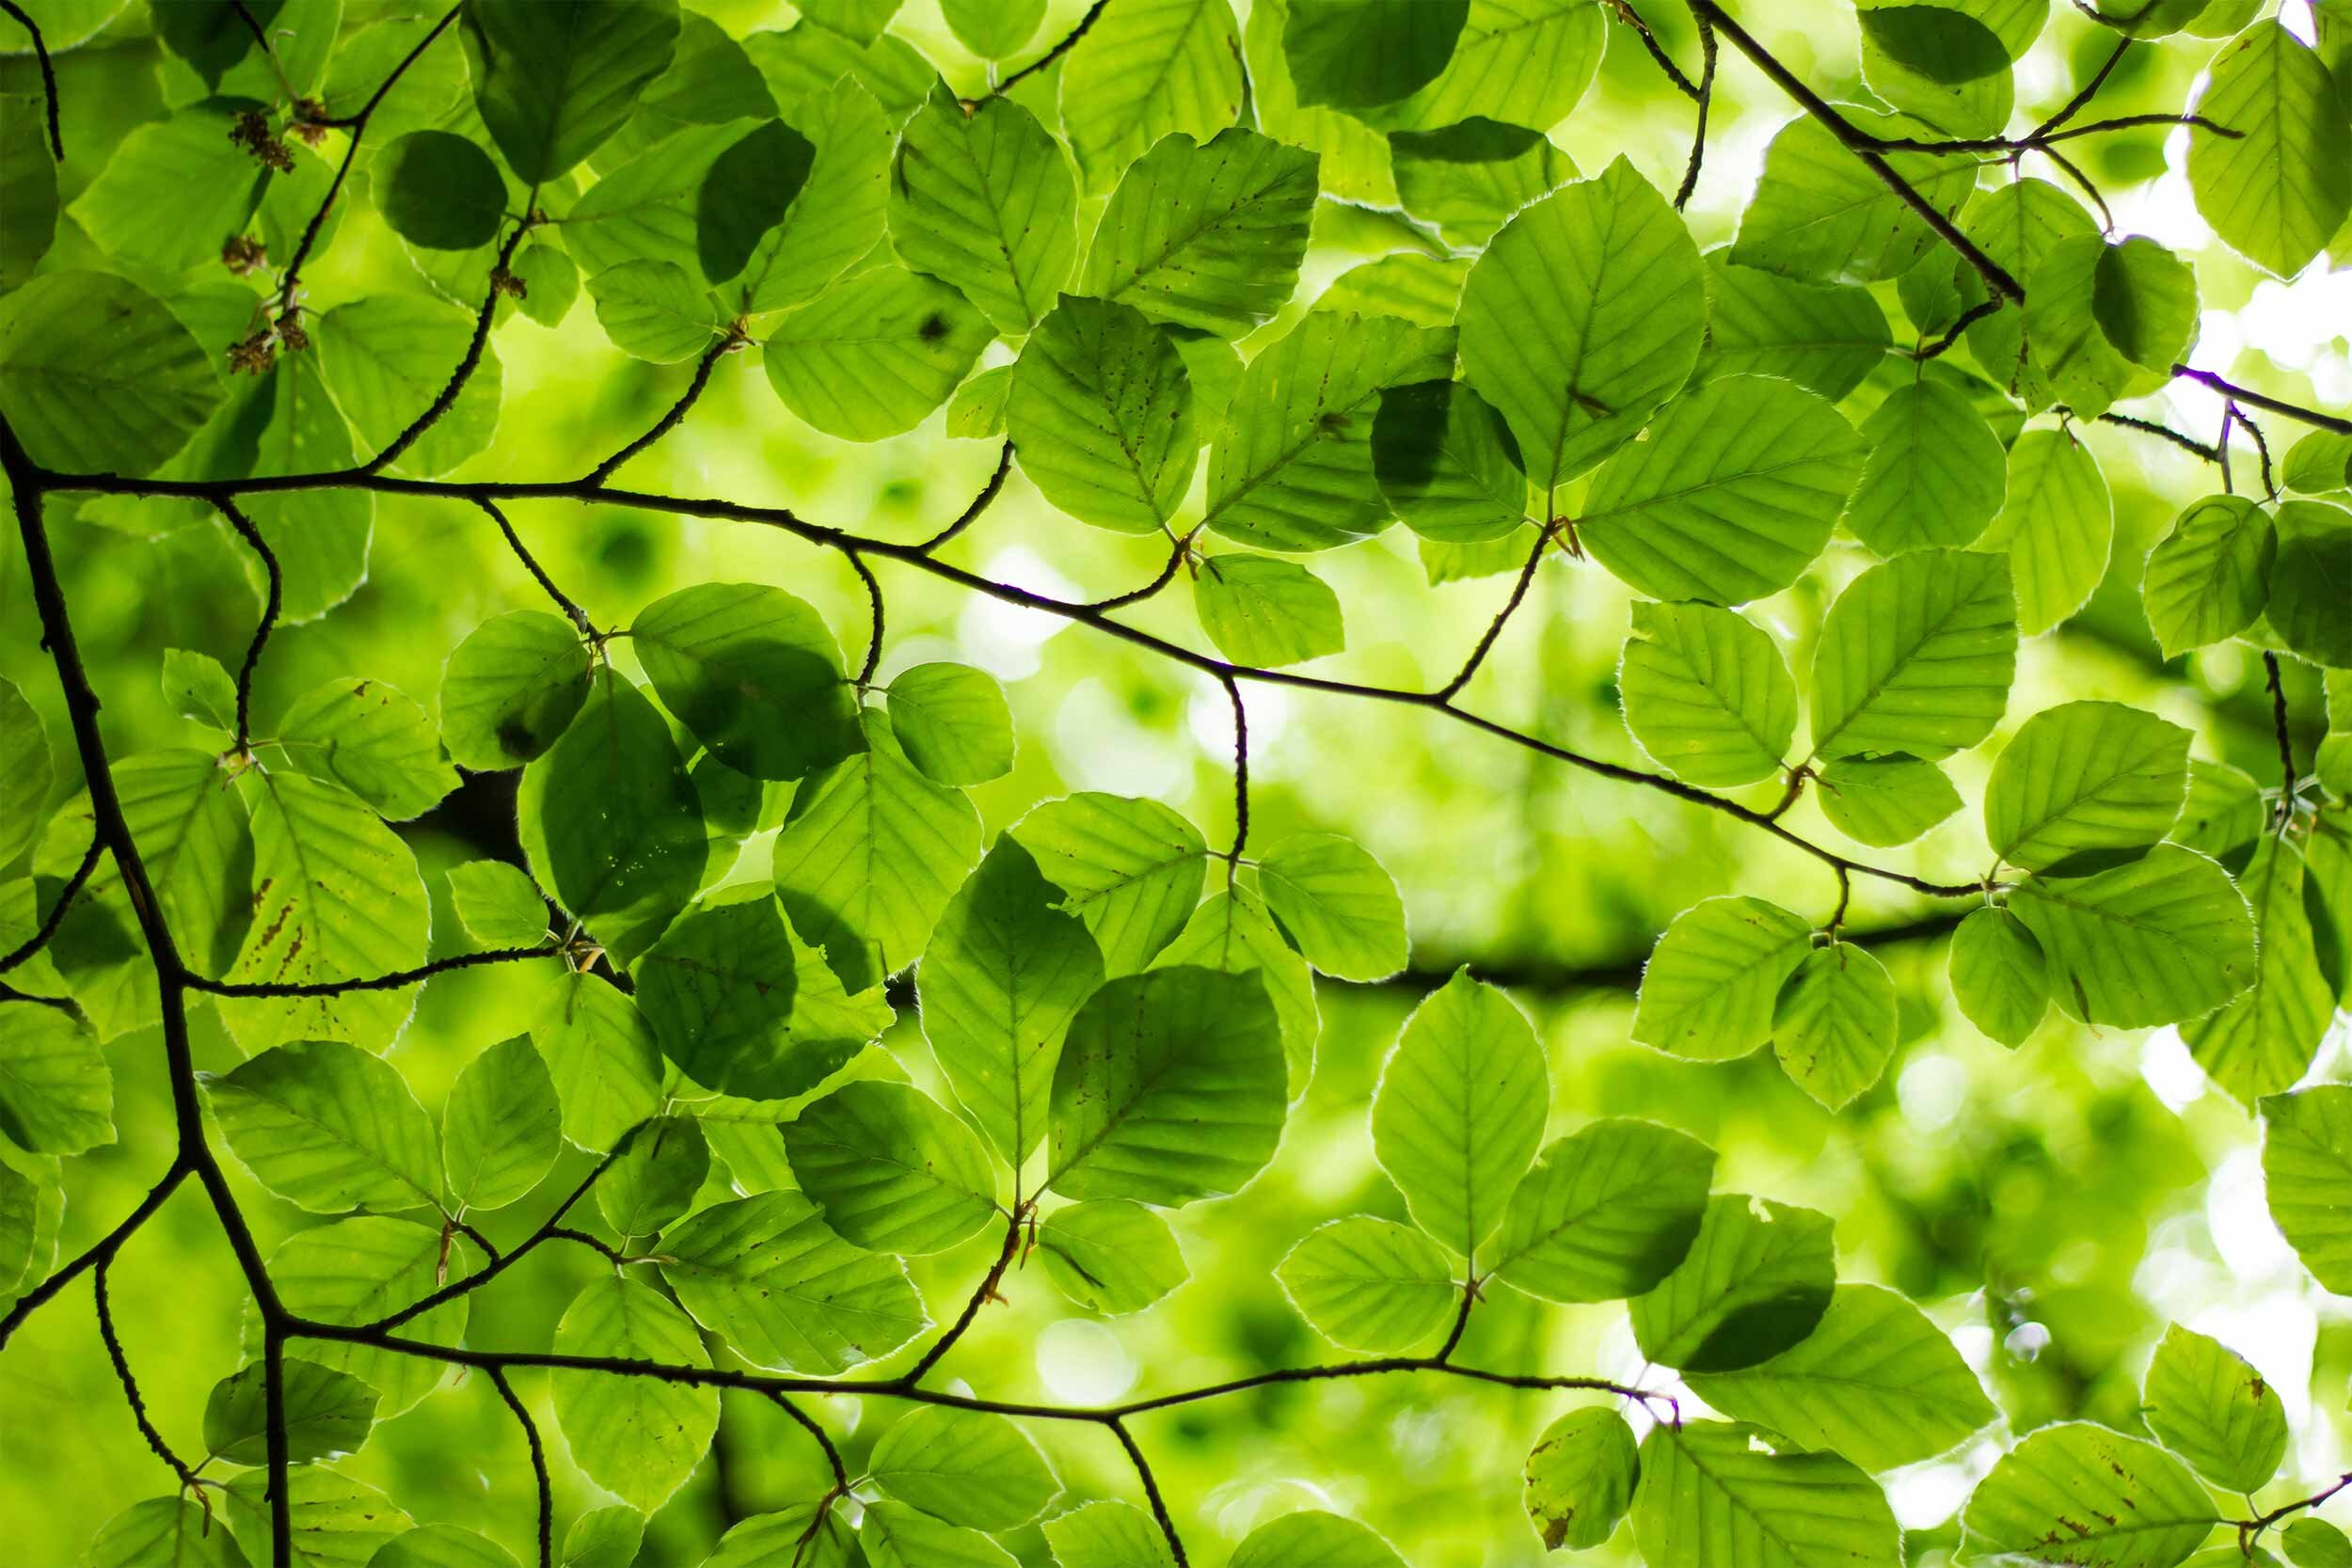 Greenery_Photosynthesis_Grow Lights.jpg